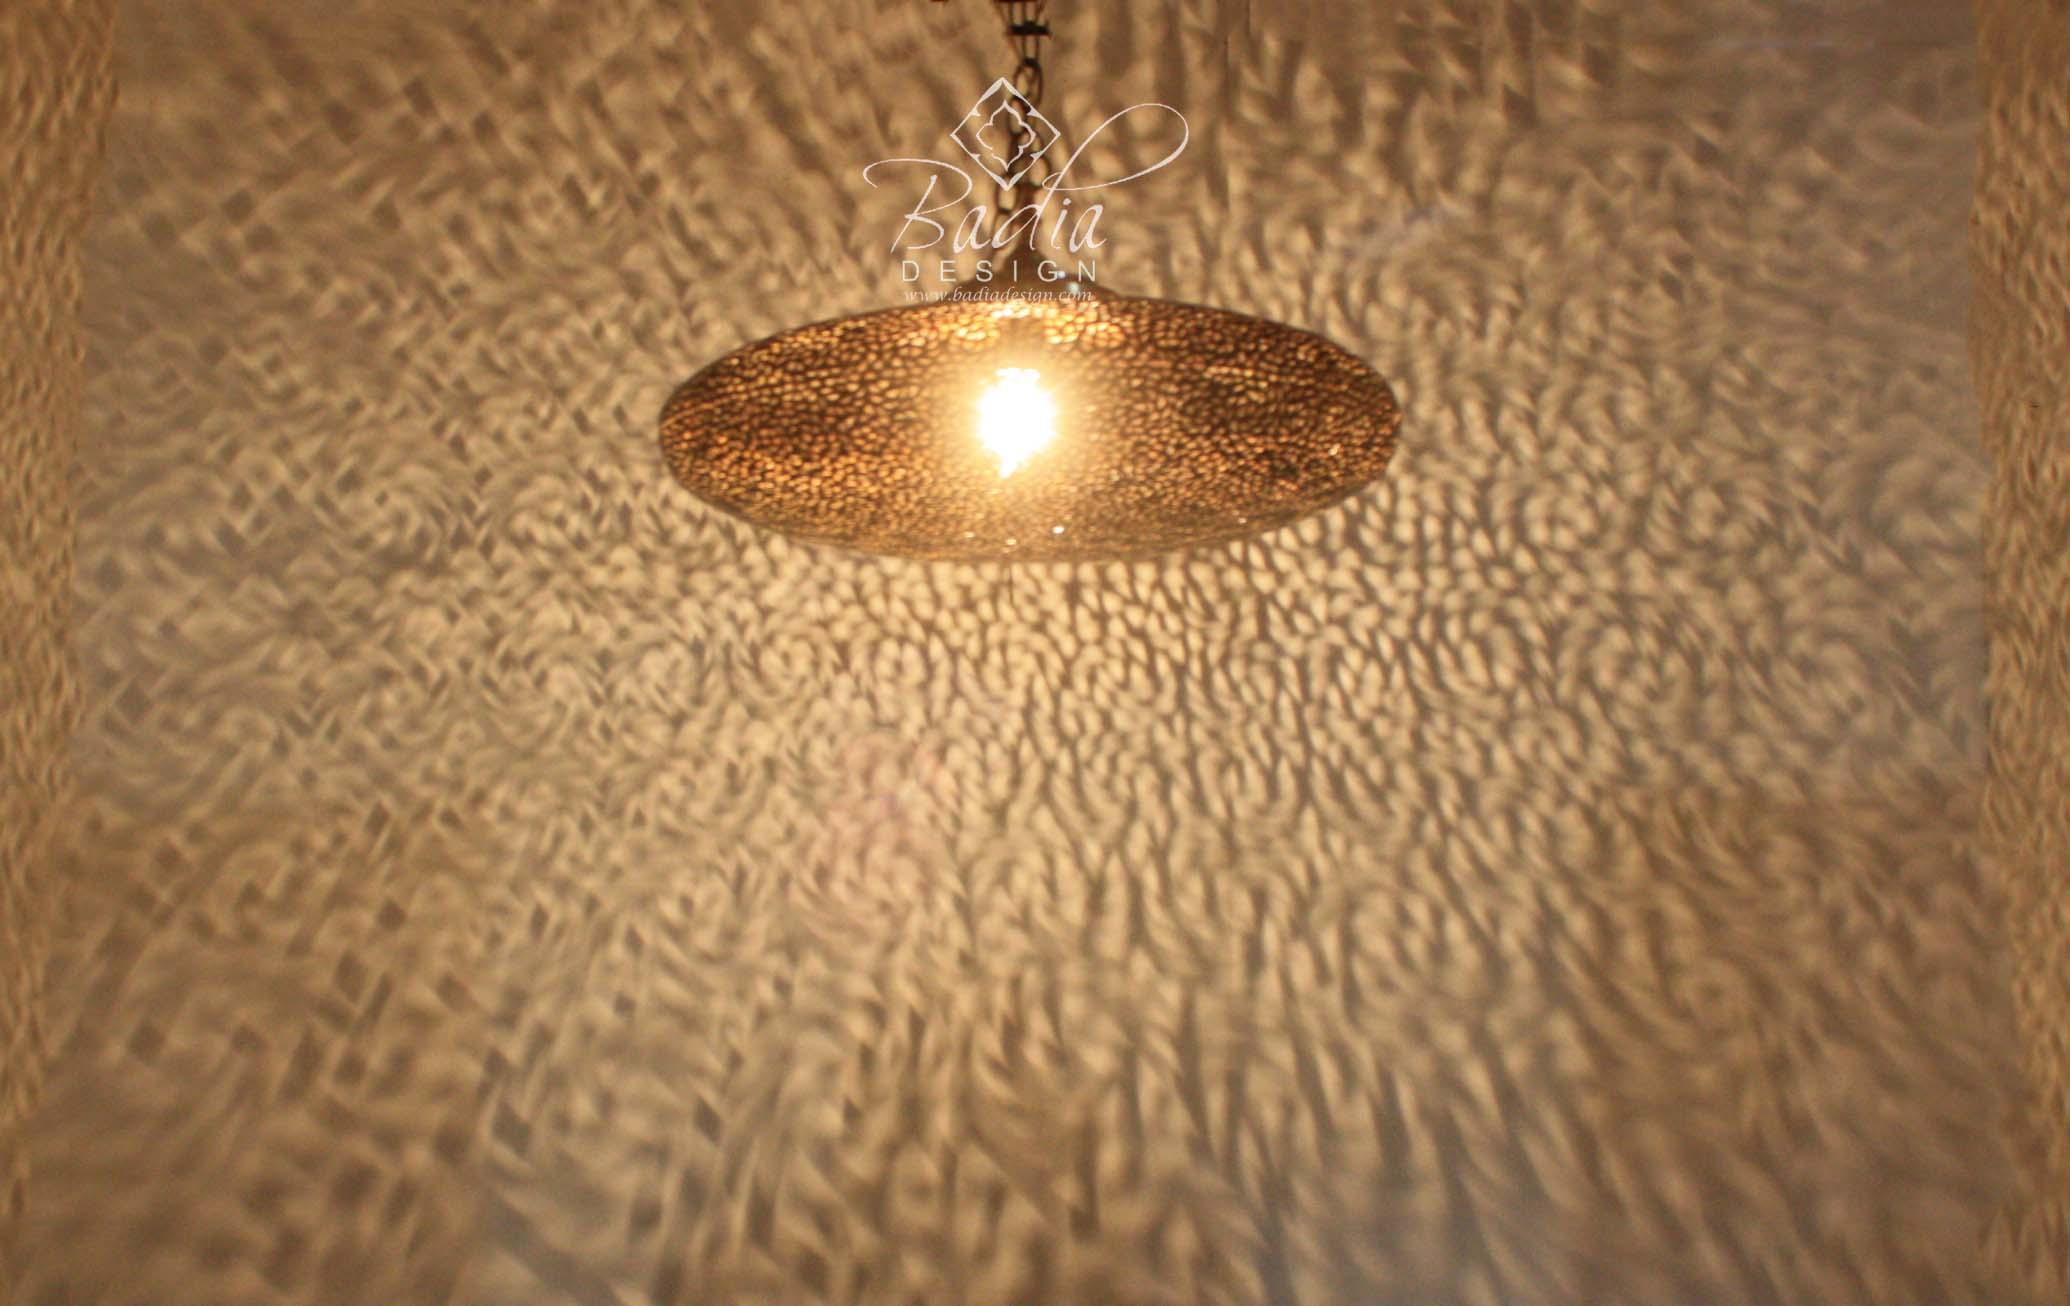 moroccan-ufo-shaped-brass-lantern-lig358-2.jpg